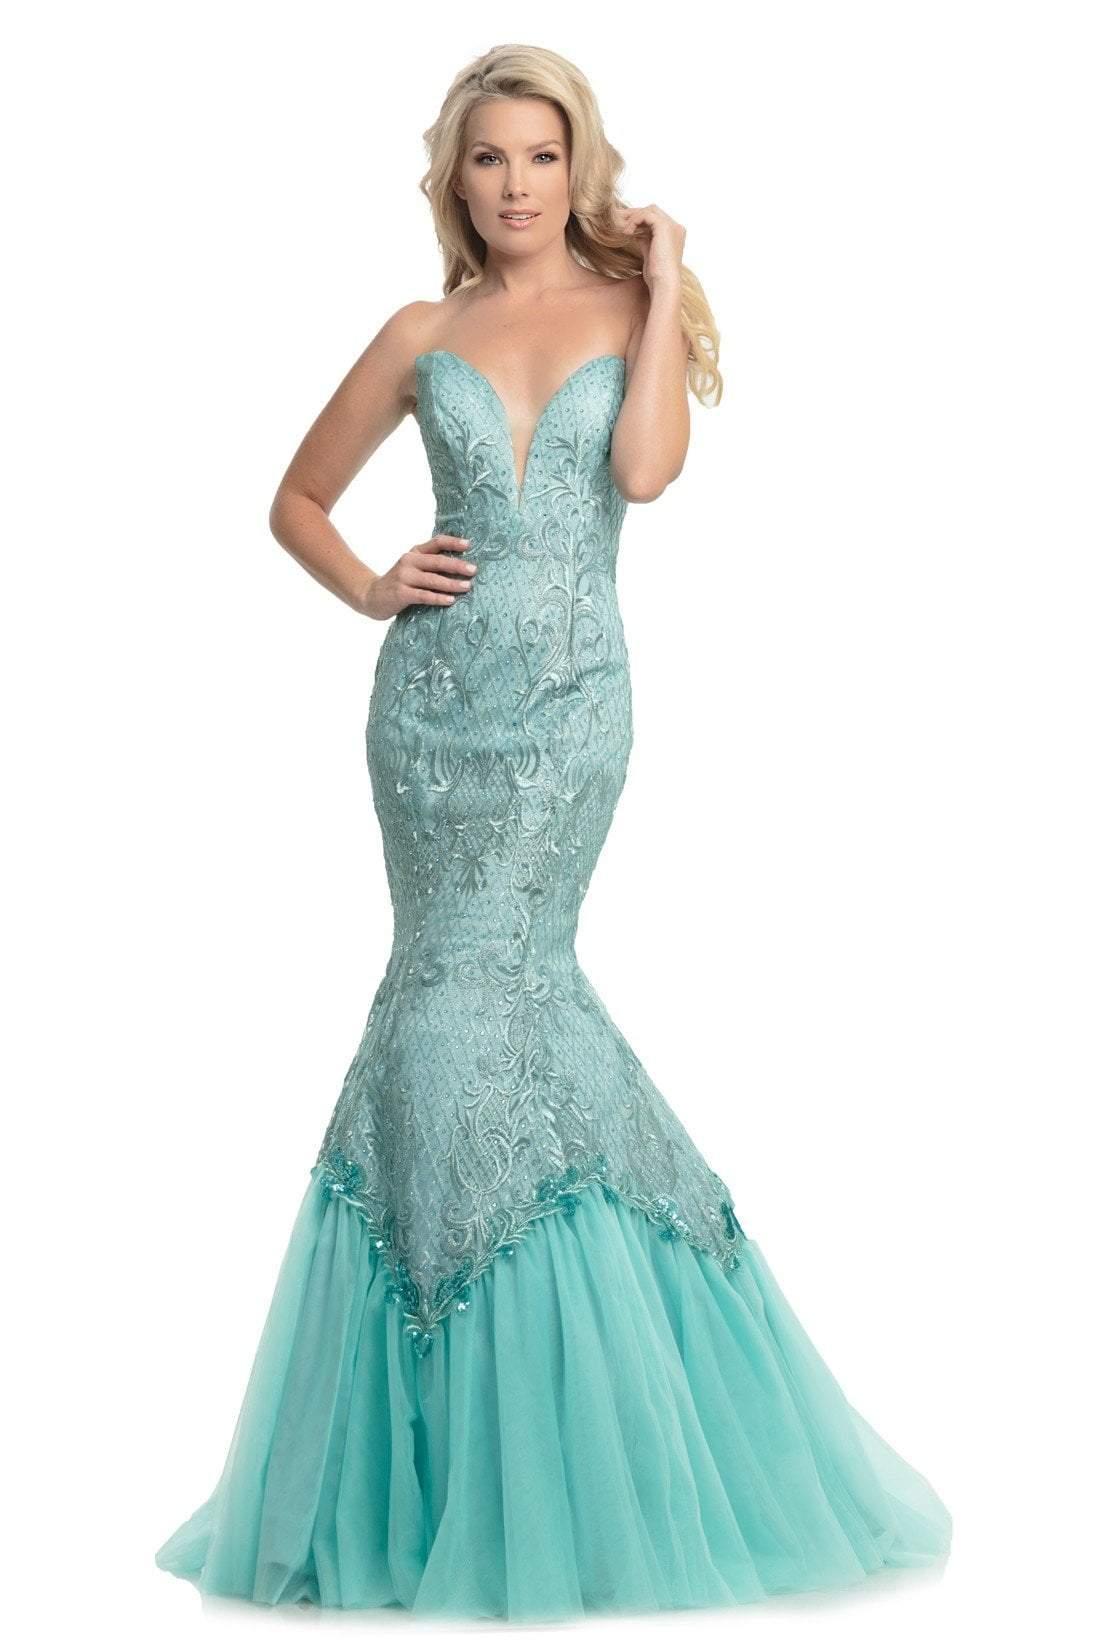 Johnathan Kayne - 9001 Dramatically Embellished Strapless Mermaid Gown